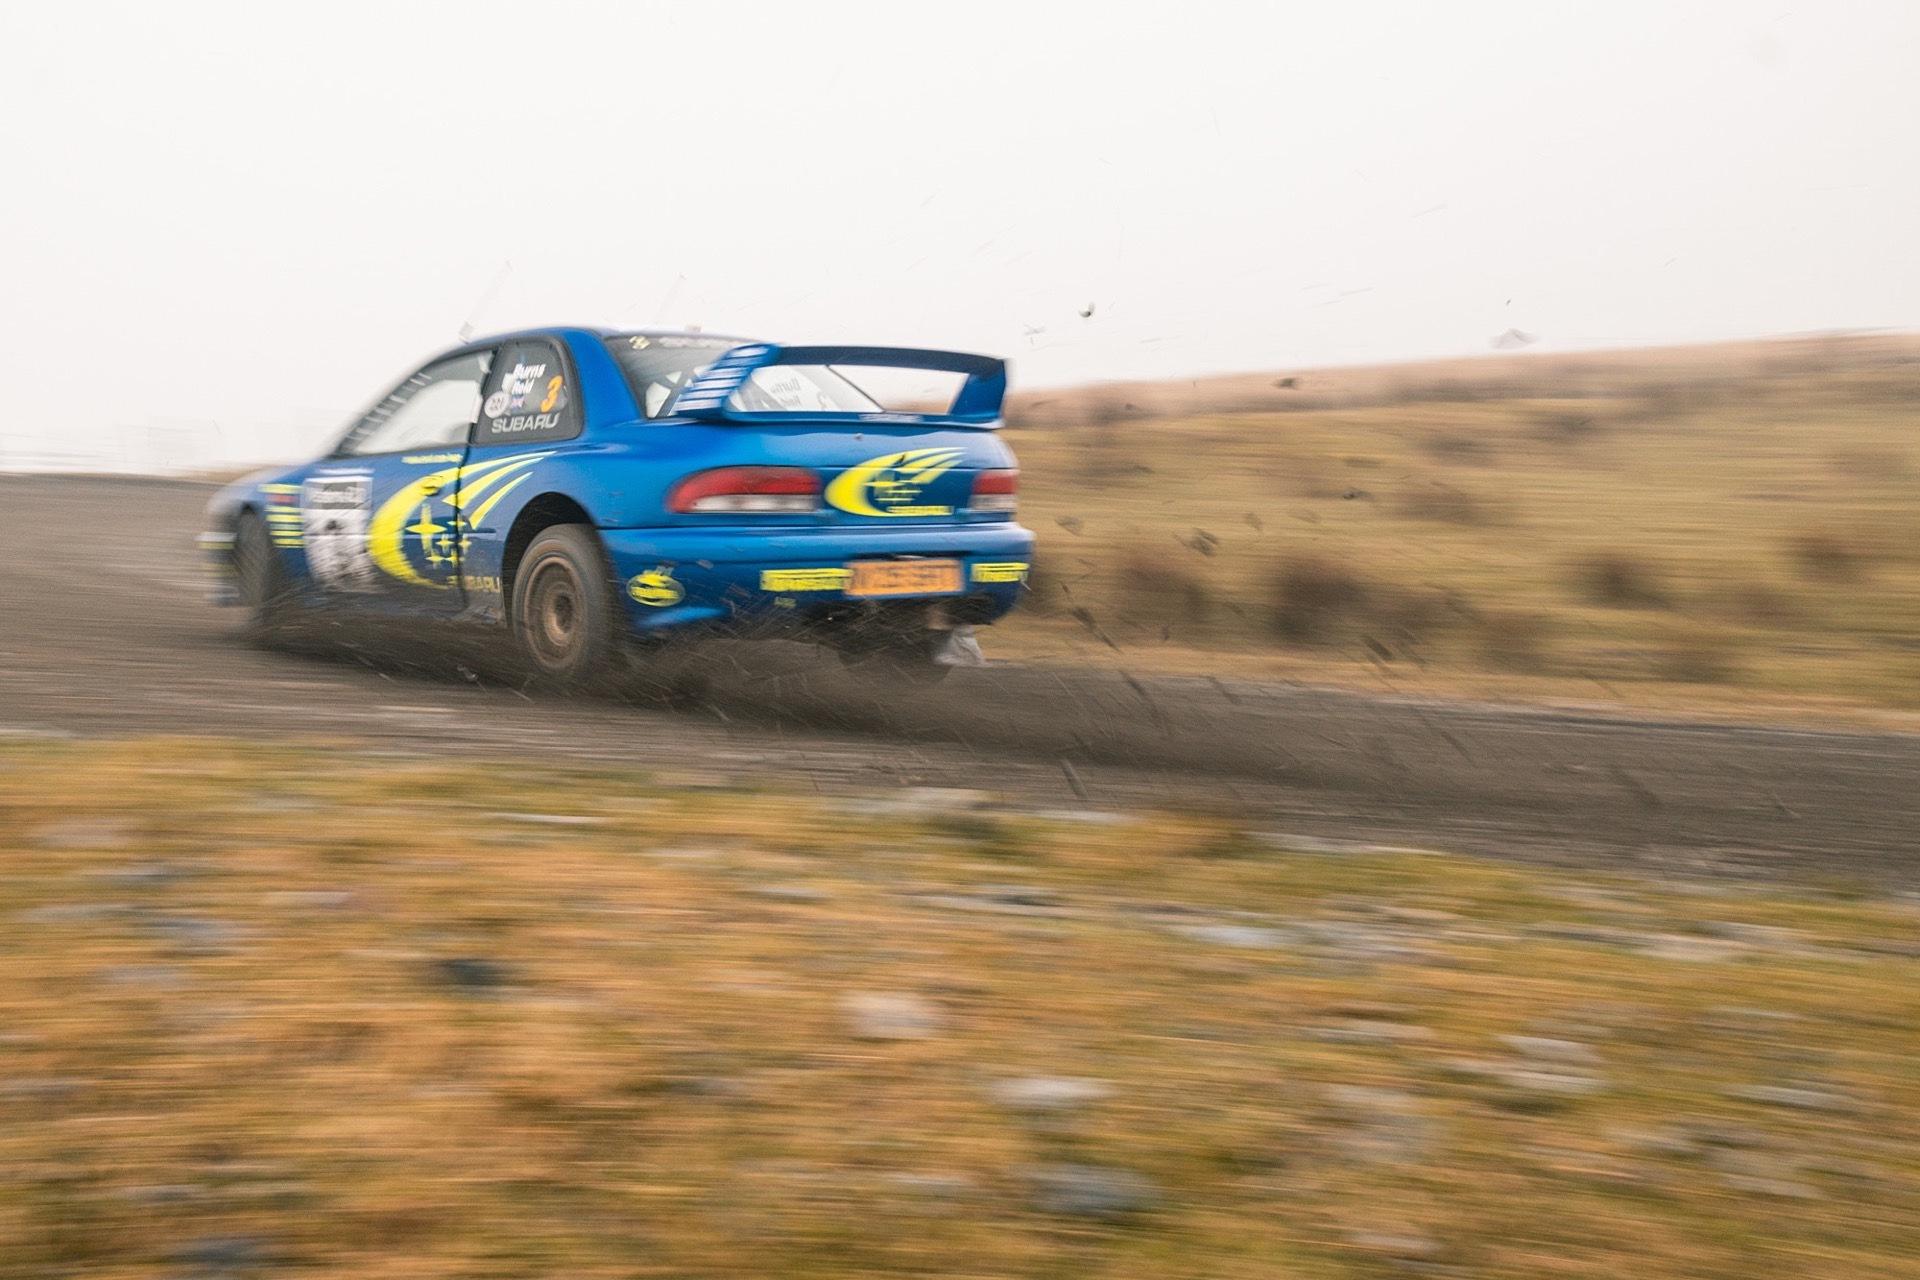 Richard_Burns_Subaru_Impreza_WRC_sale-0020